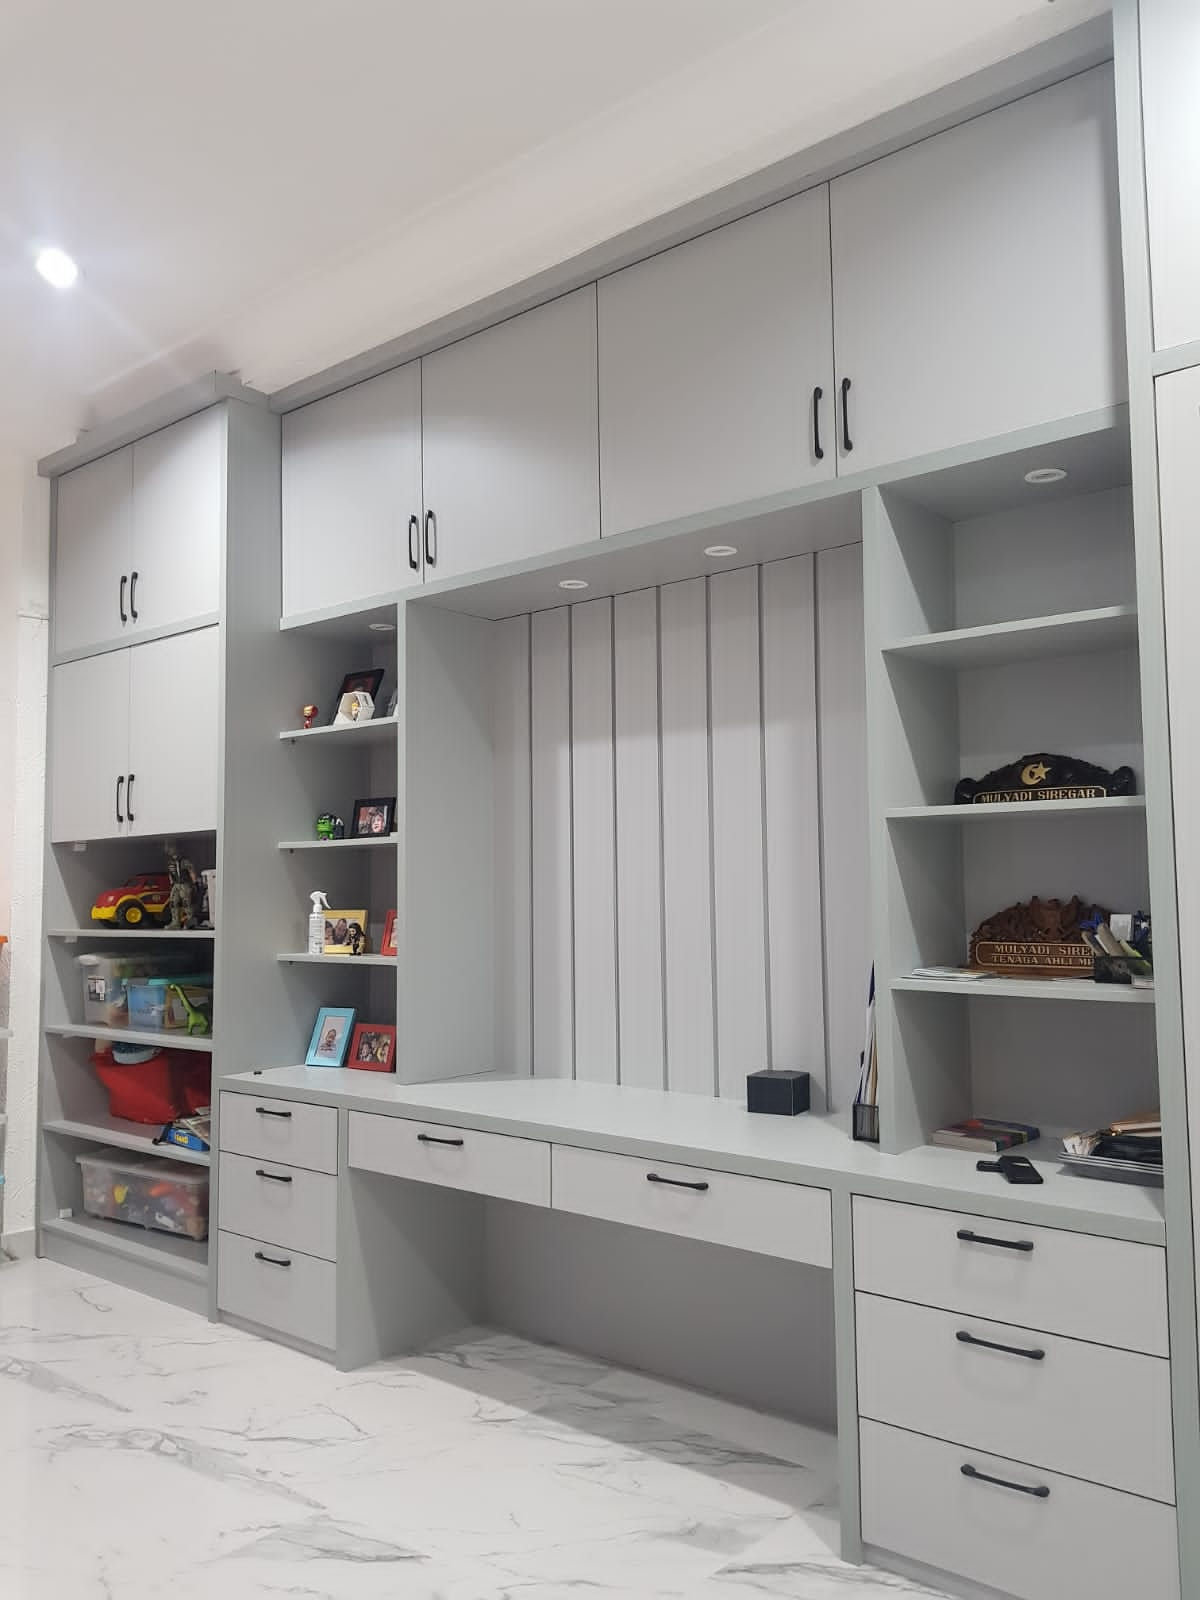 Project Belia Kitchen Set - Lemari Serbaguna - Pondok Indah - Ibu Tyaimage00001